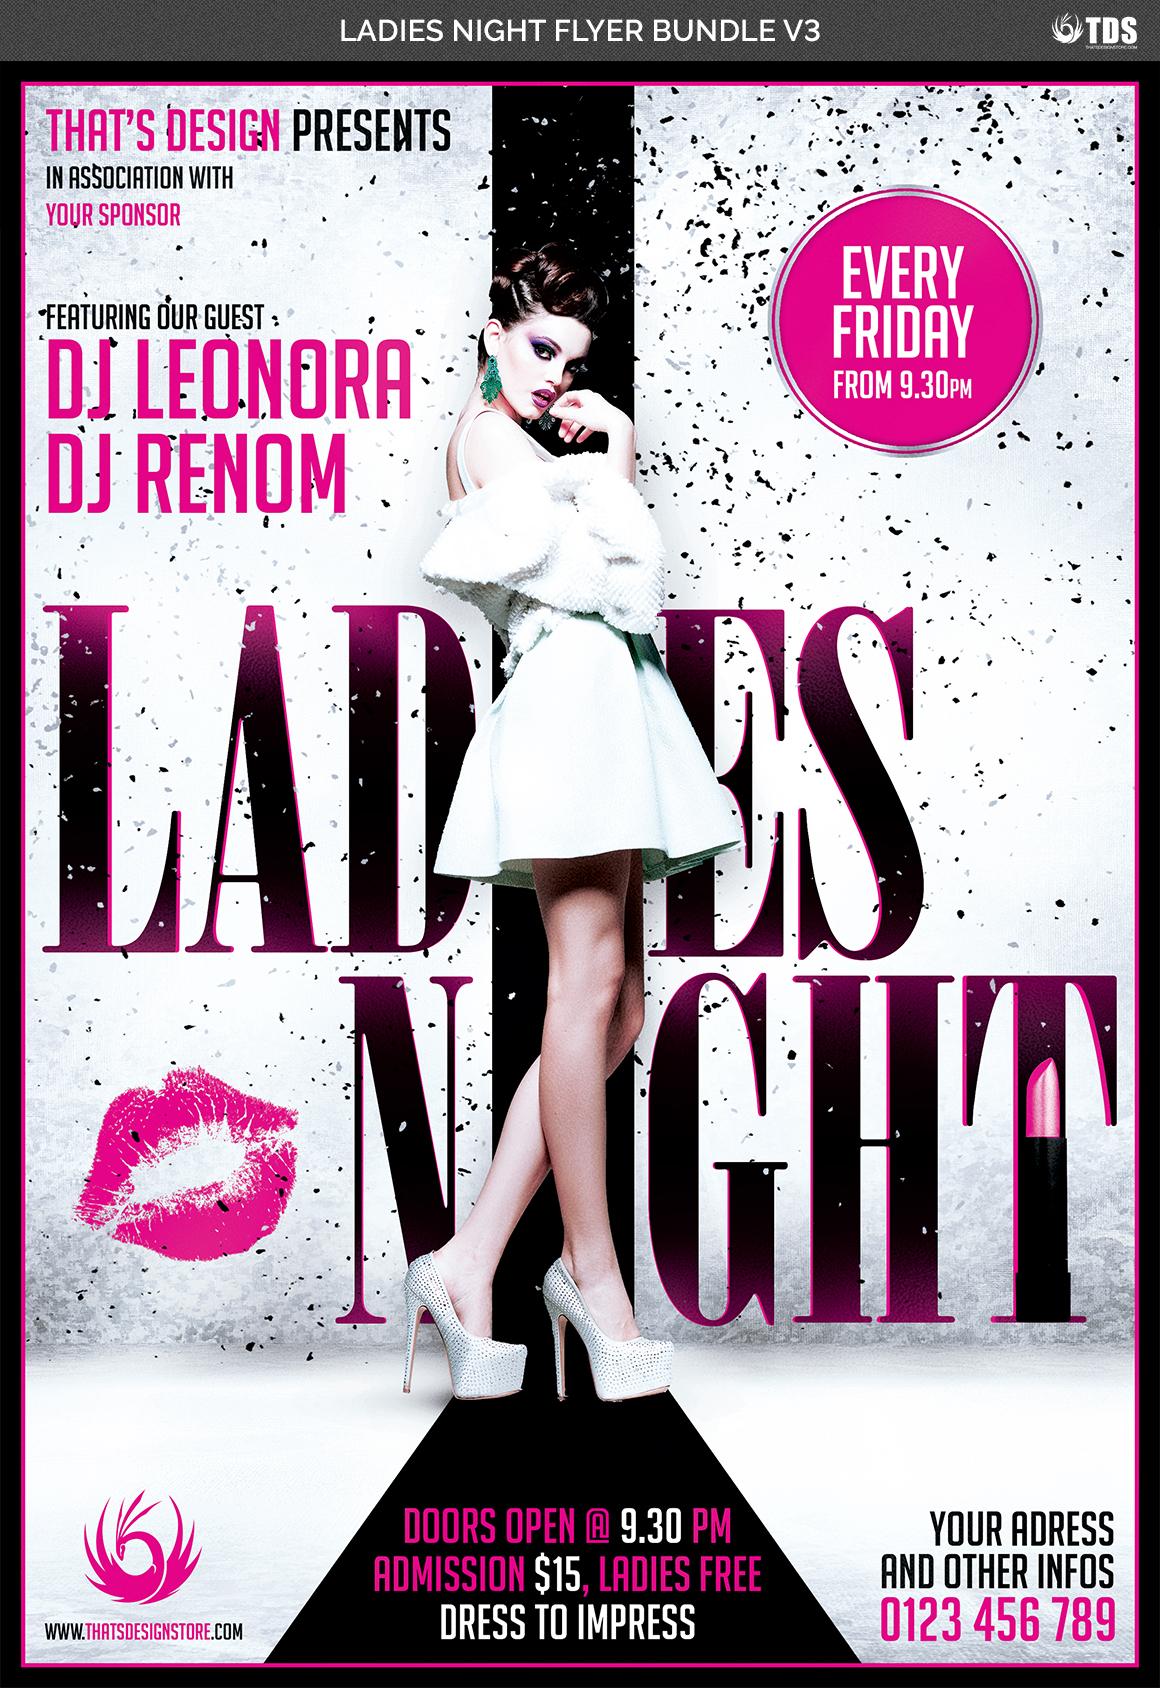 Ladies Night Flyer Bundle V3 example image 6